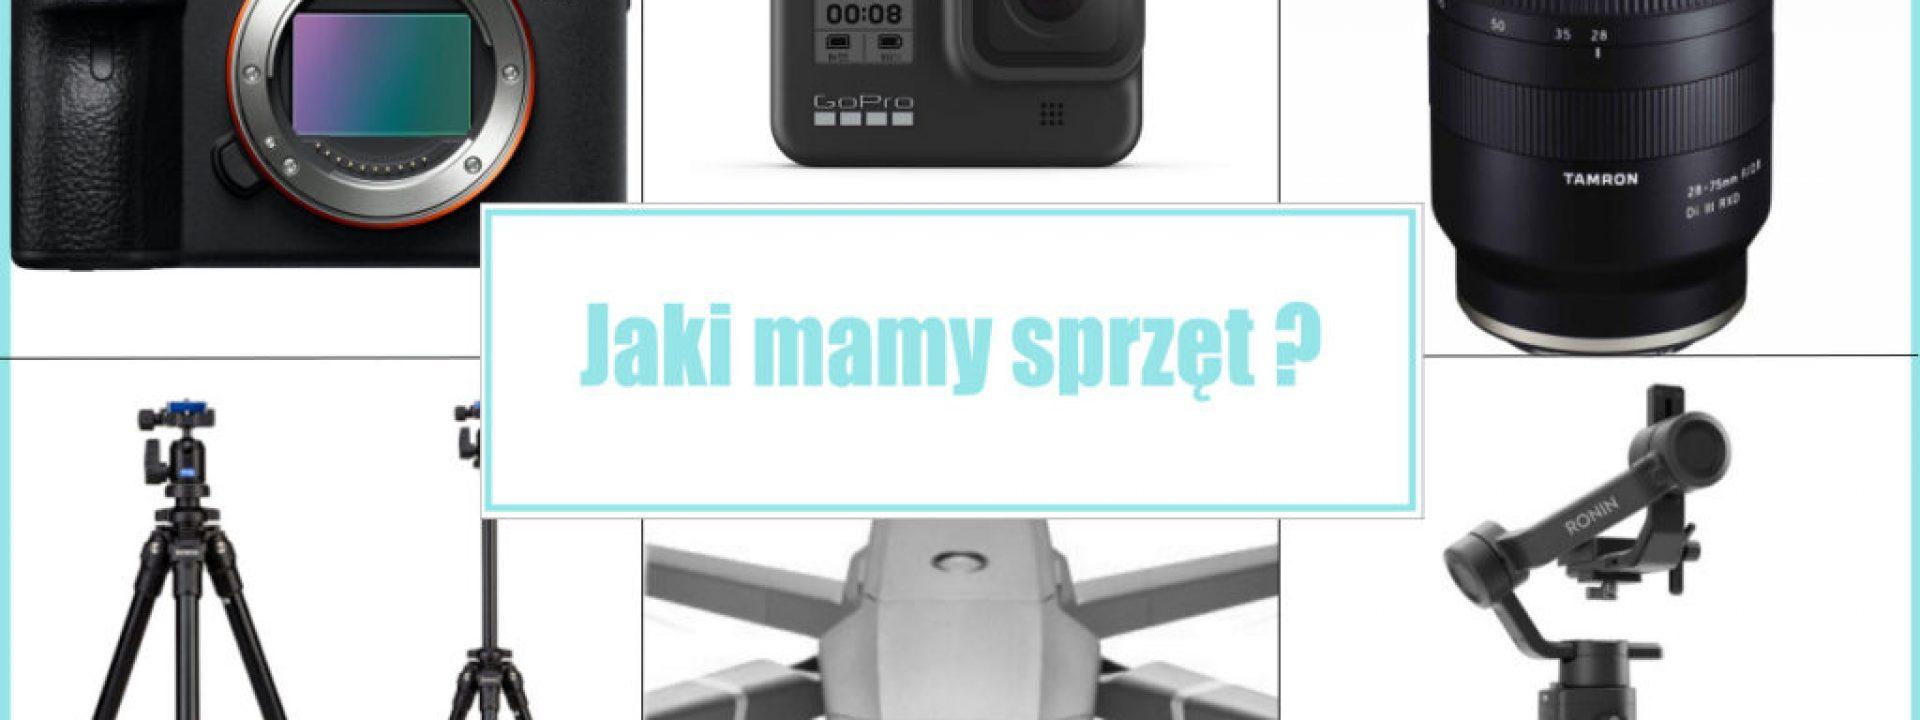 Jaki mamy aparat